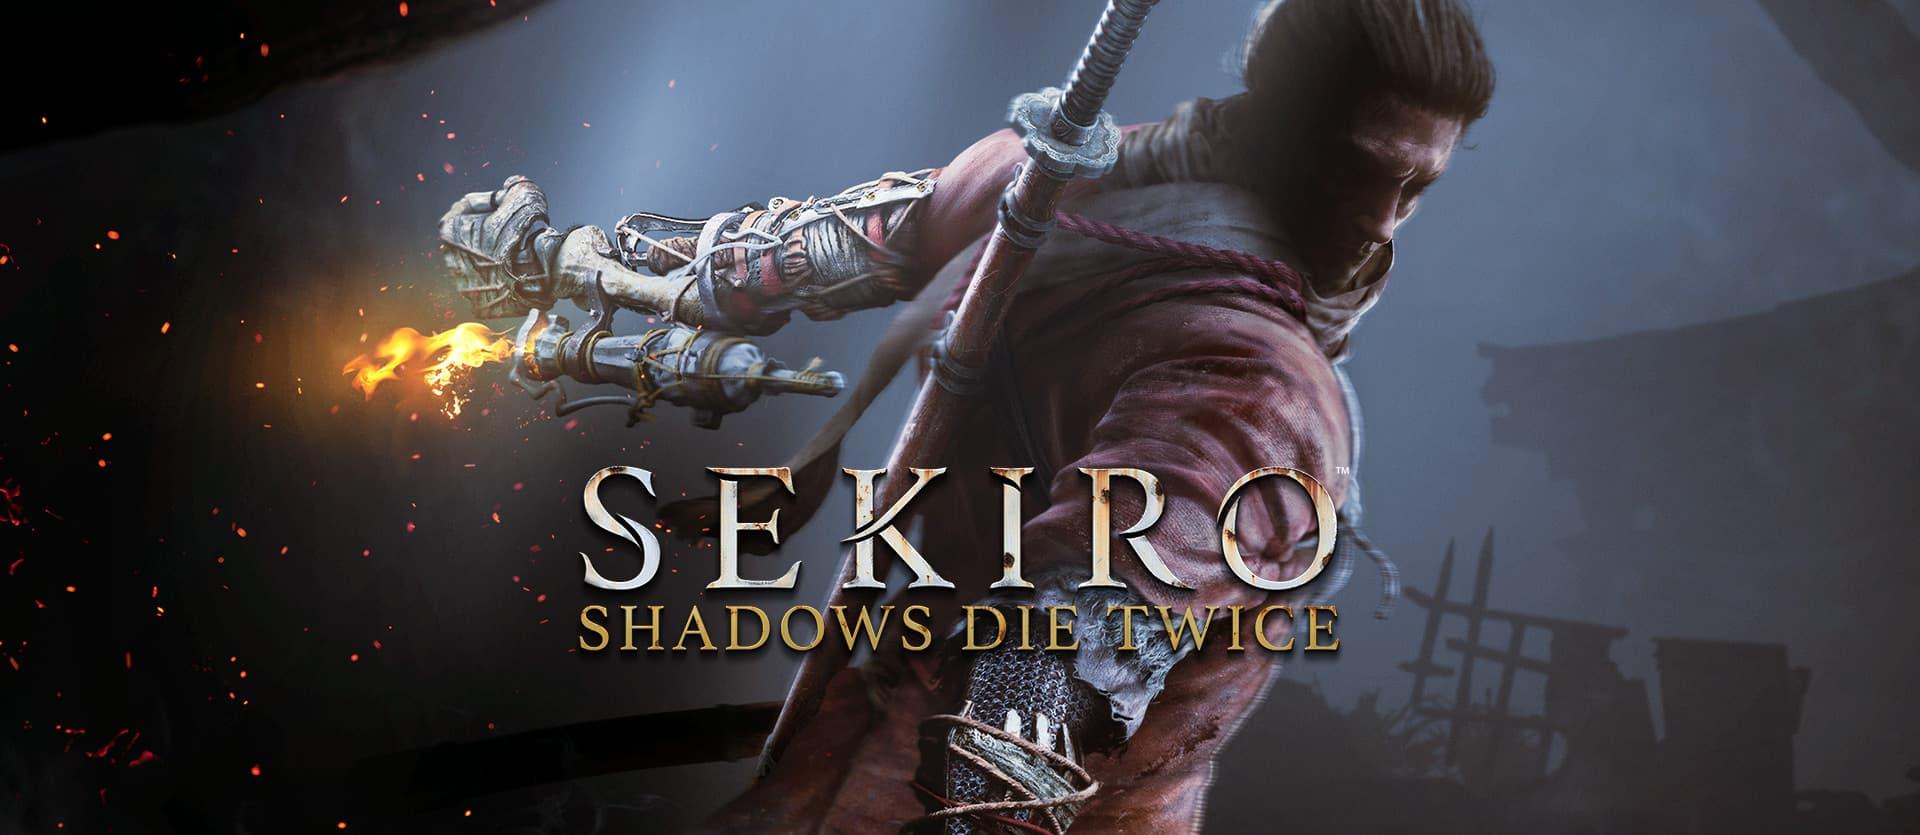 Consigue Sekiro Shadows Die Twice para Xbox One a un gran precio 5